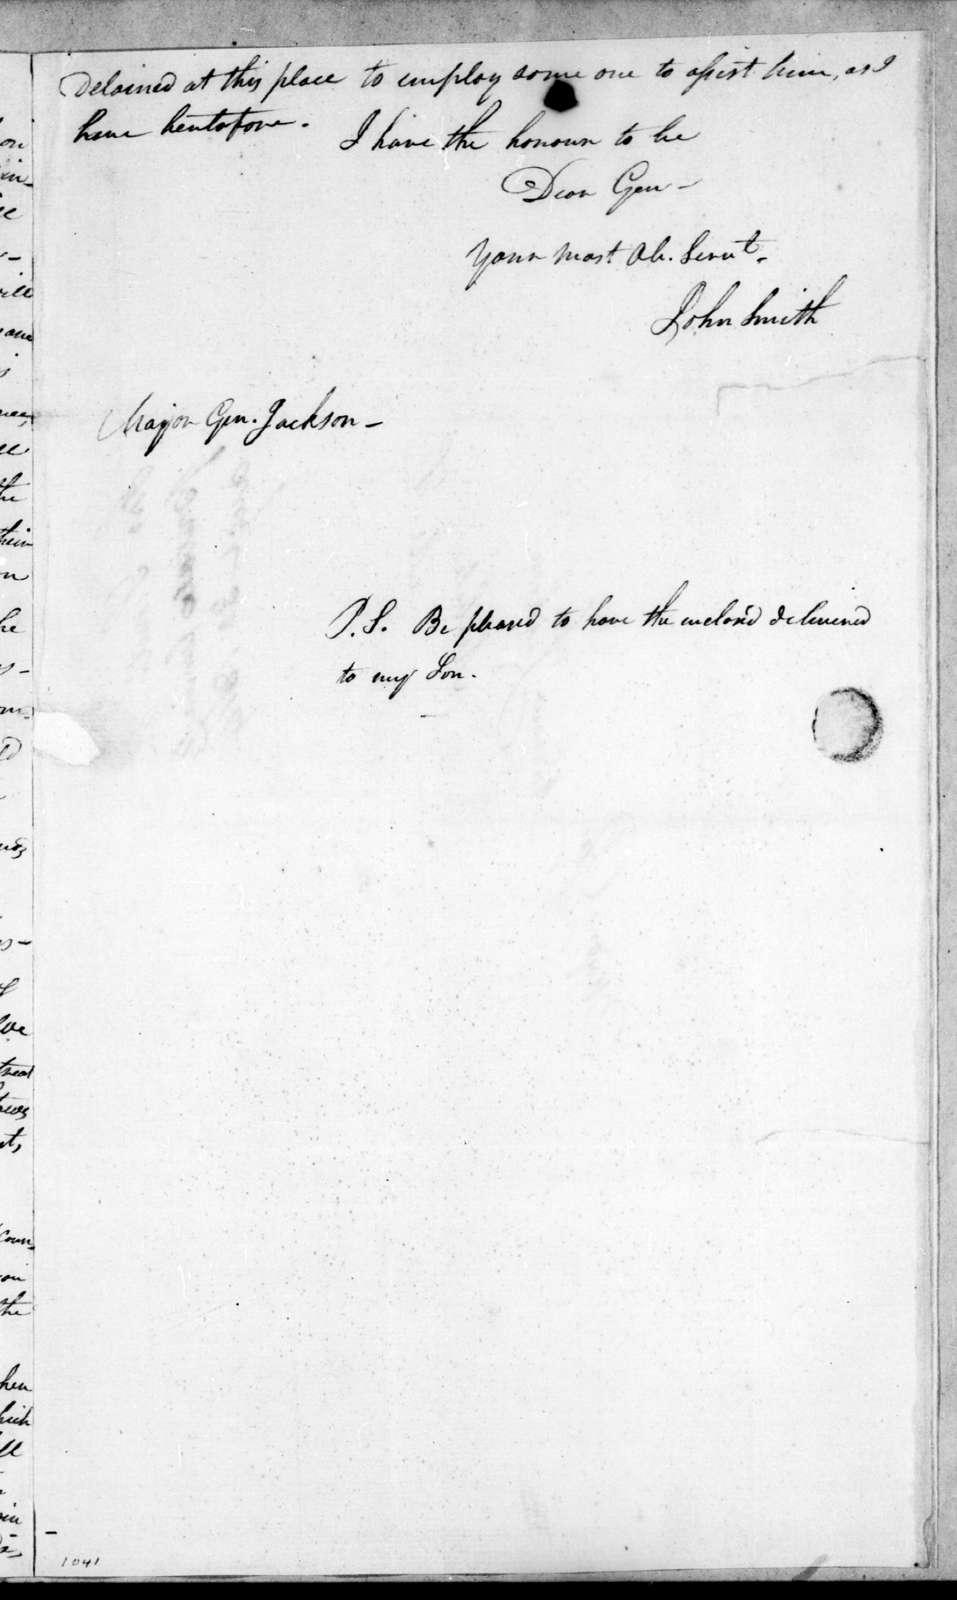 John Smith to Andrew Jackson, August 30, 1814